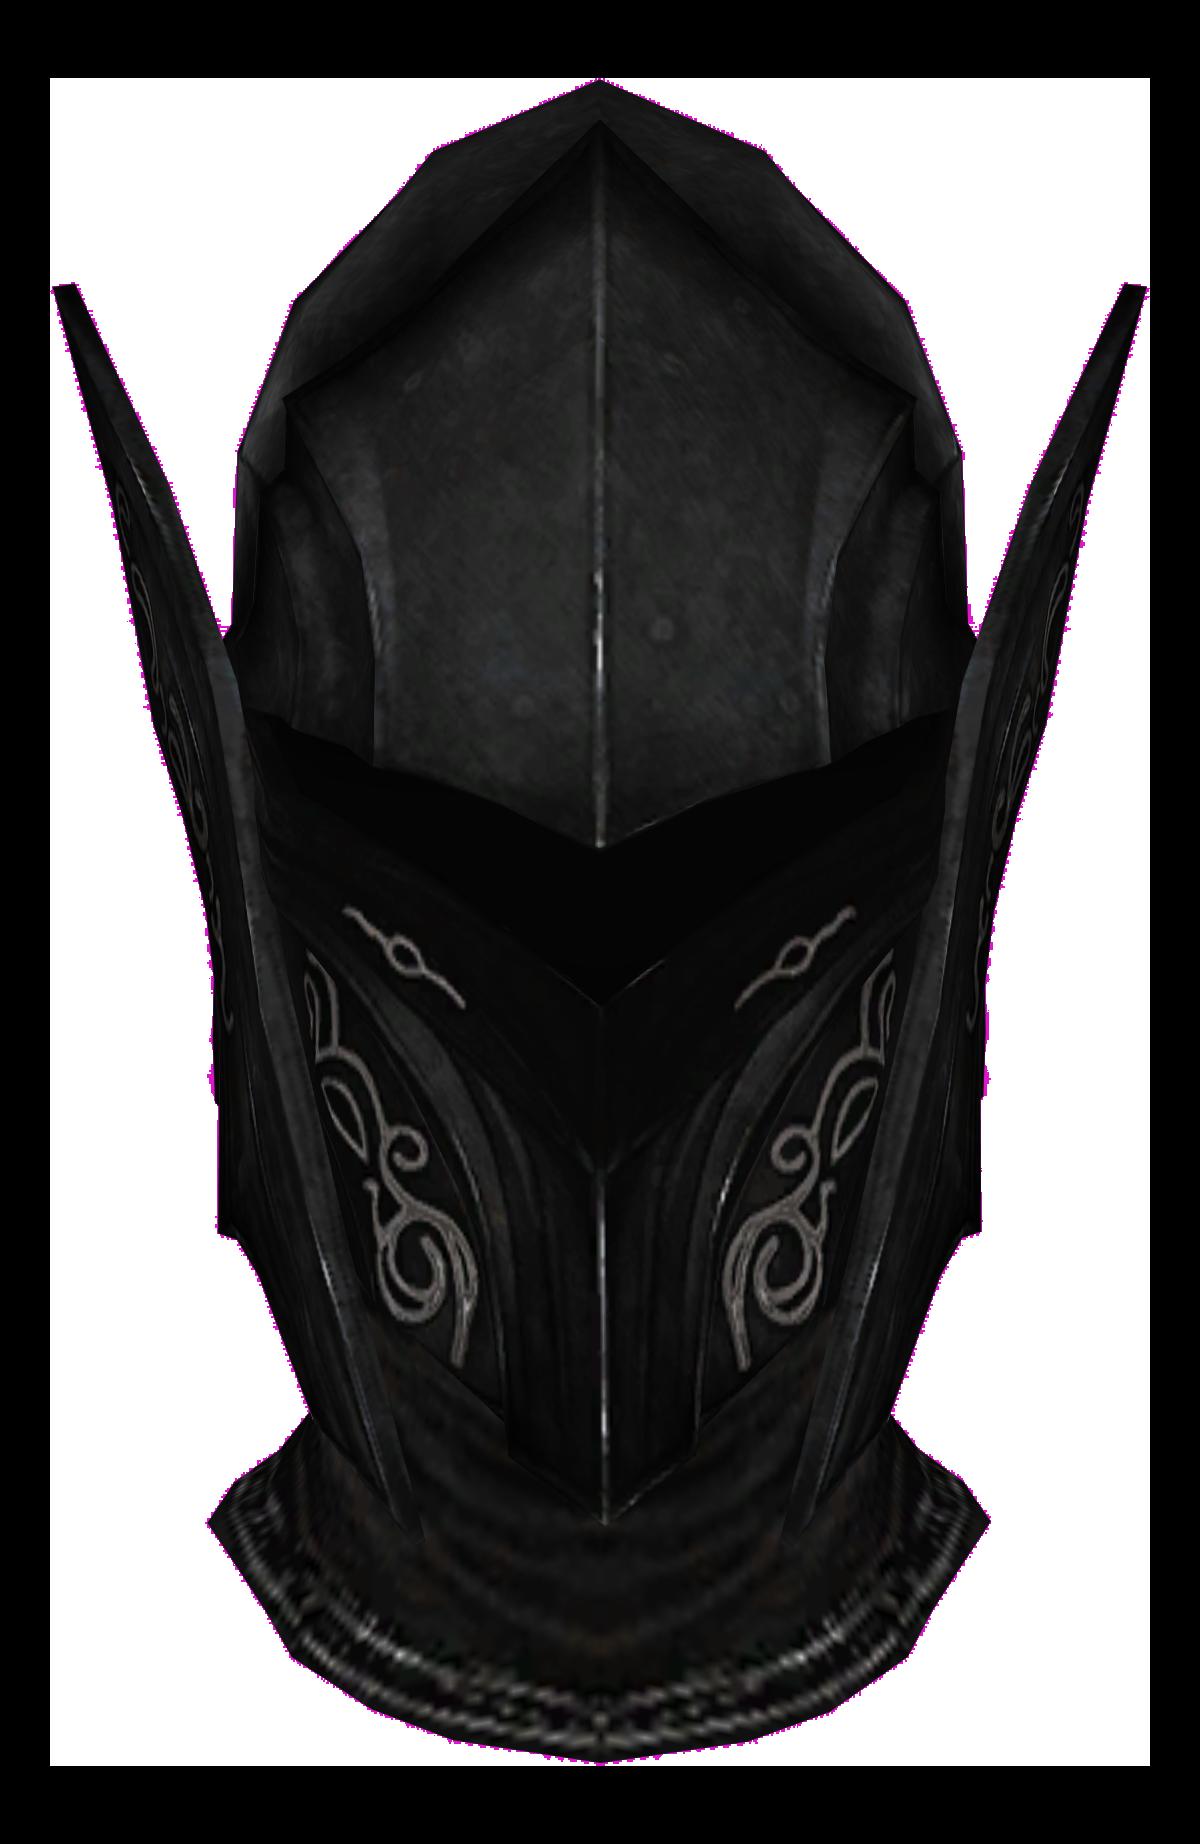 Ebony Helmet (Skyrim)